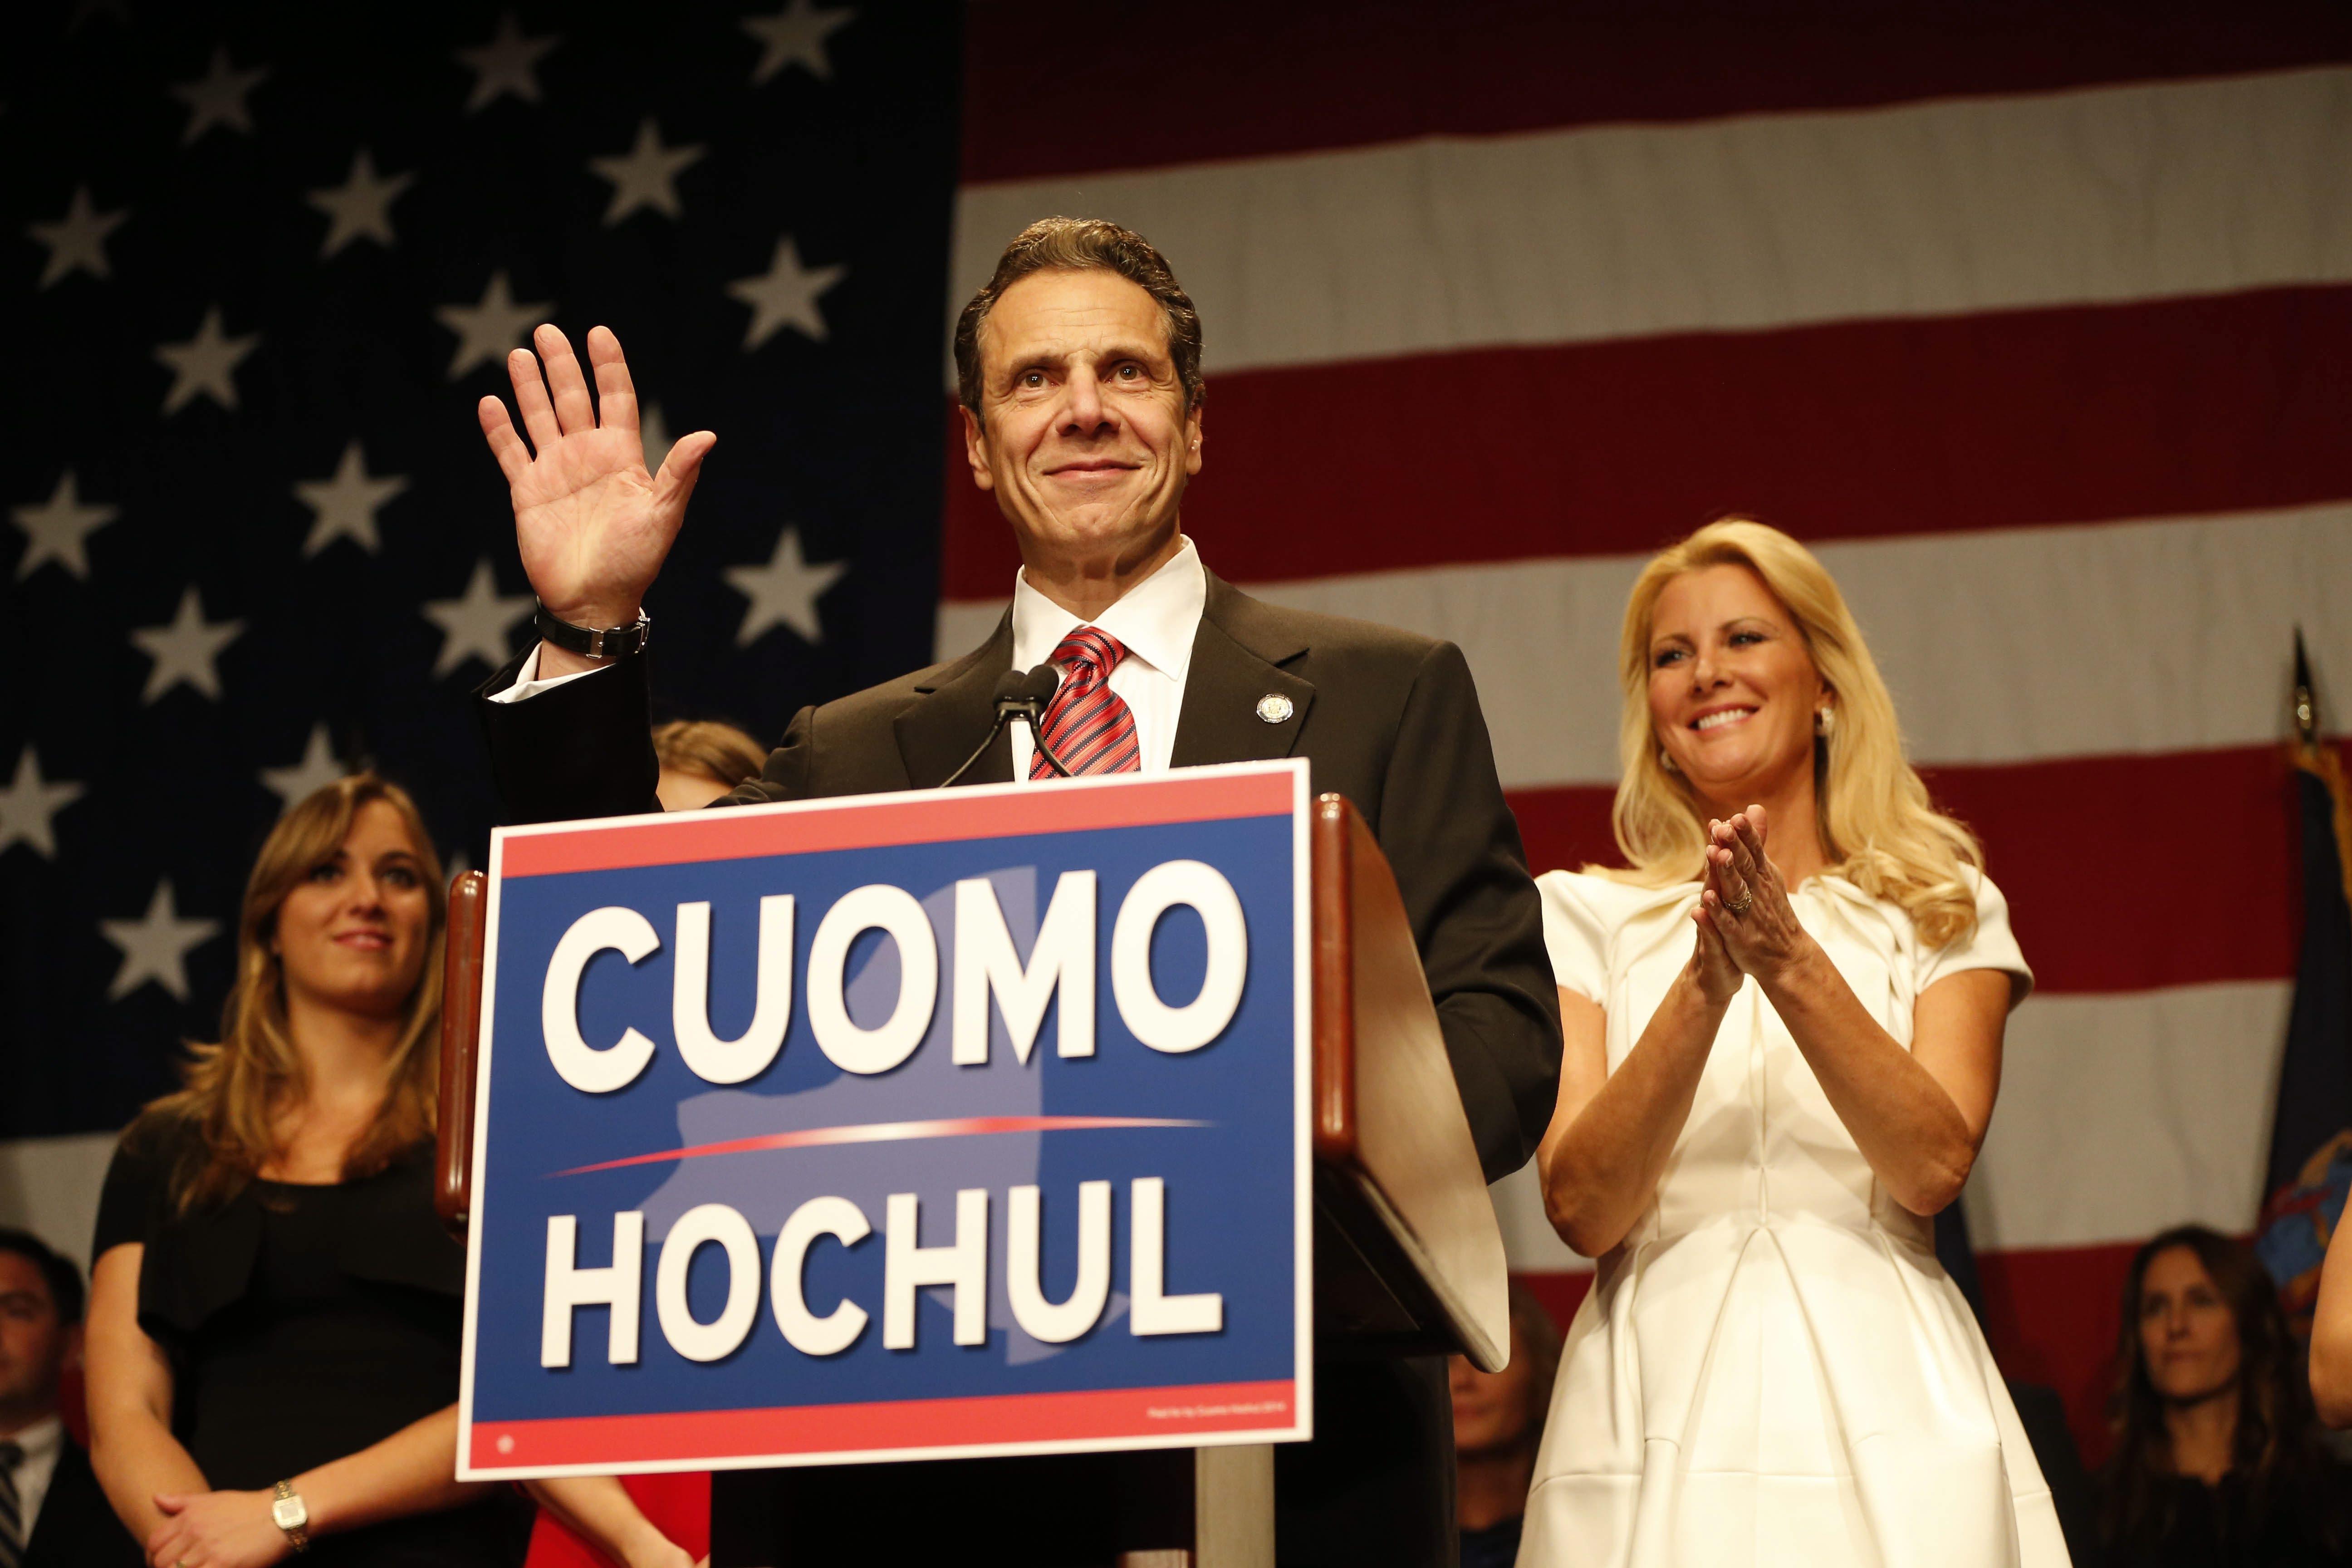 Gov. Andrew Cuomo speaks at the Sheraton New York Times Square in New York City, Tuesday, Nov. 4, 2014. (Derek Gee/Buffalo News)